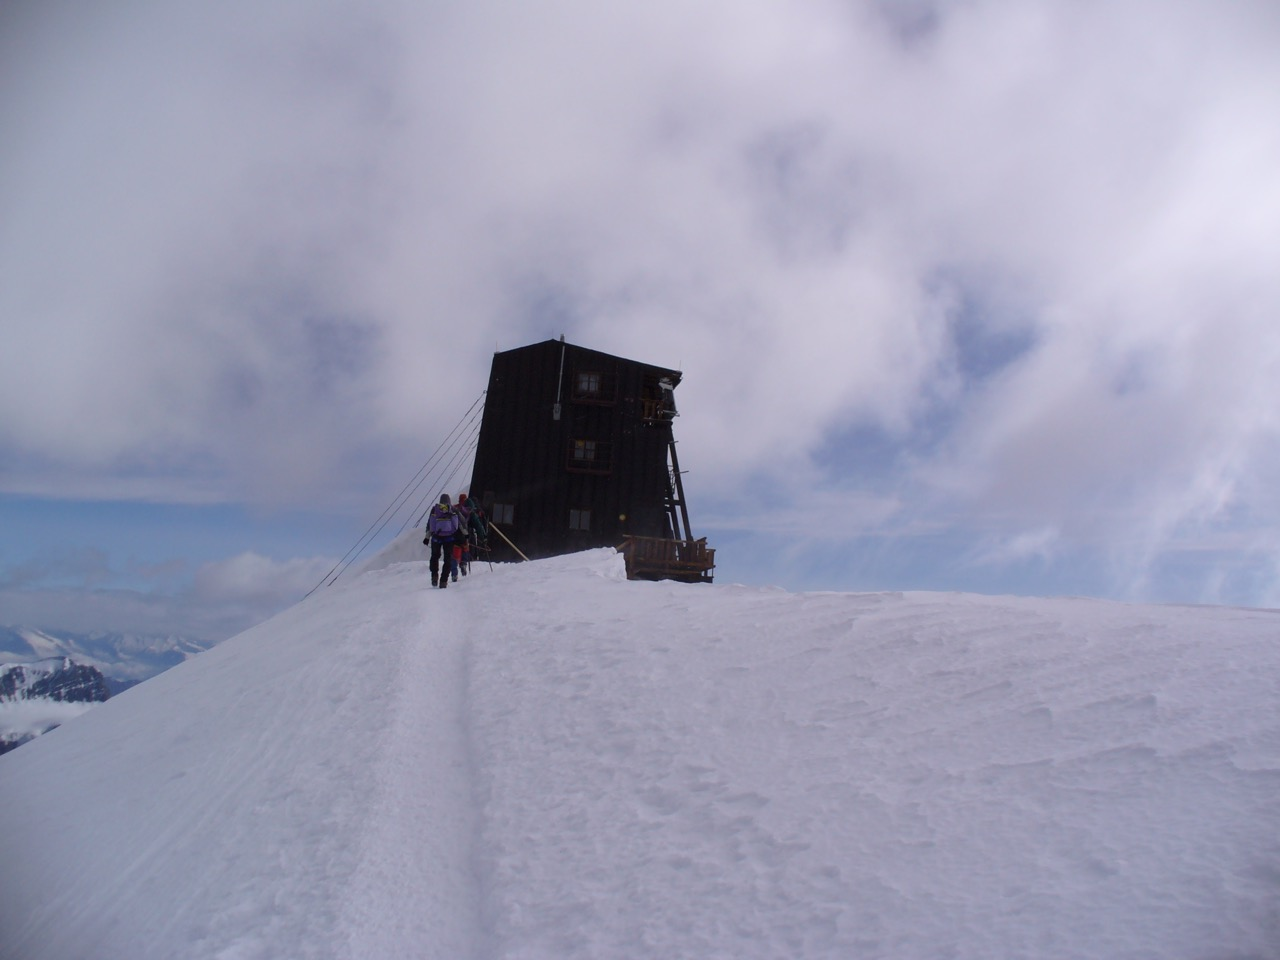 Venerdì 14 e sabato 15 luglio: Punta Gnifetti – Rif. Regina Margherita, Piramide Vincent e sentiero Walser